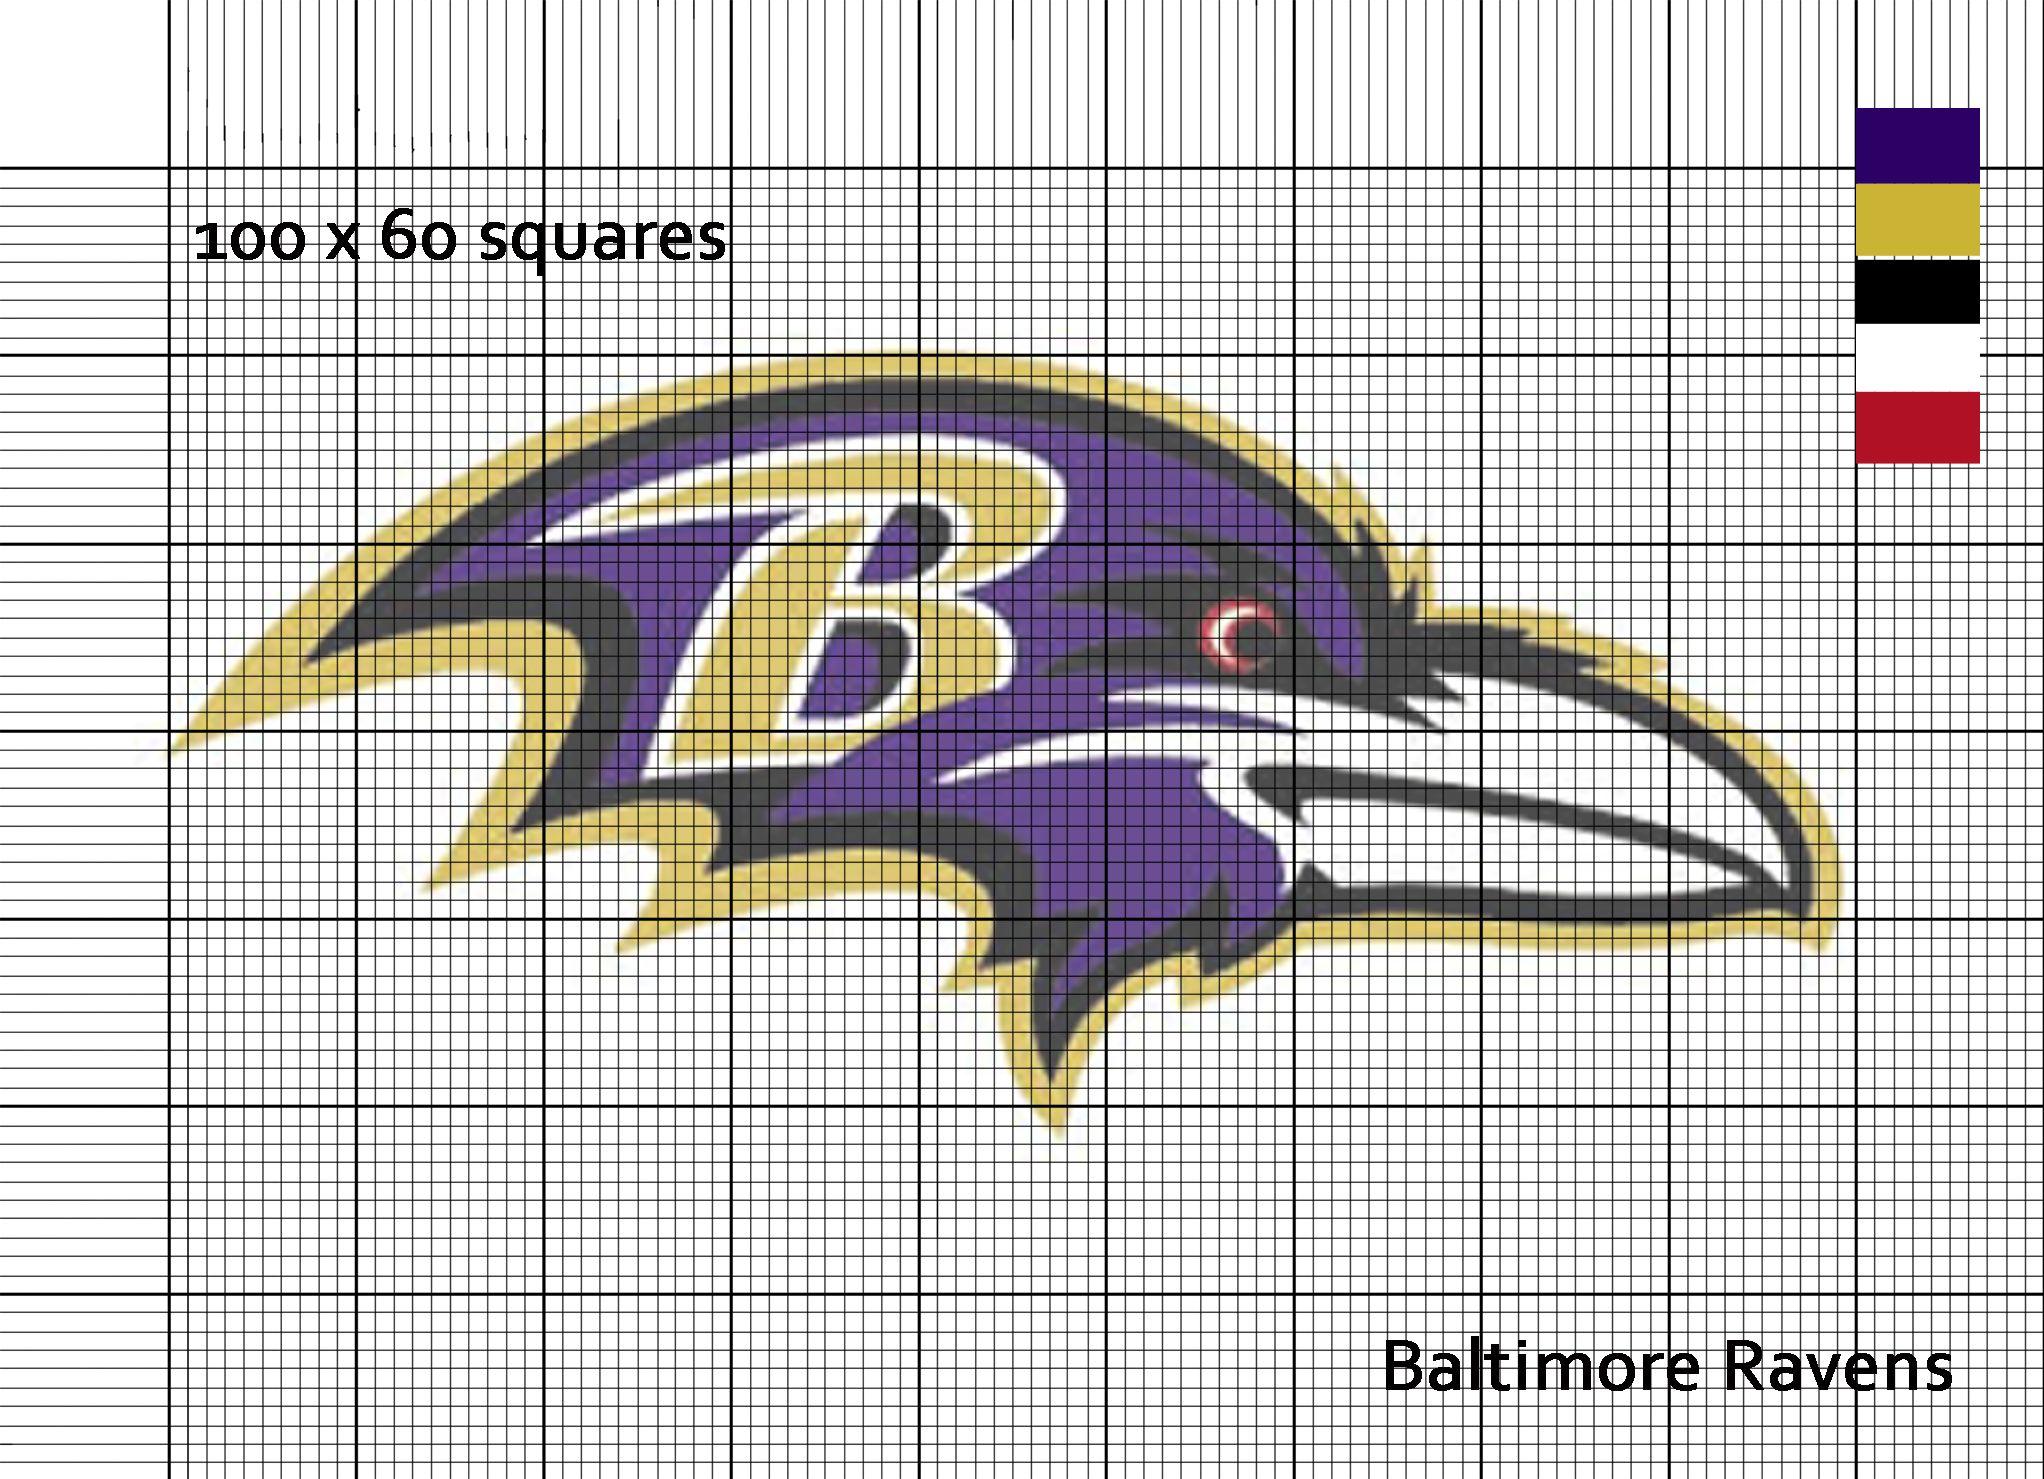 Baltimore Ravens Nfl Logo Cross Stitch Pattern